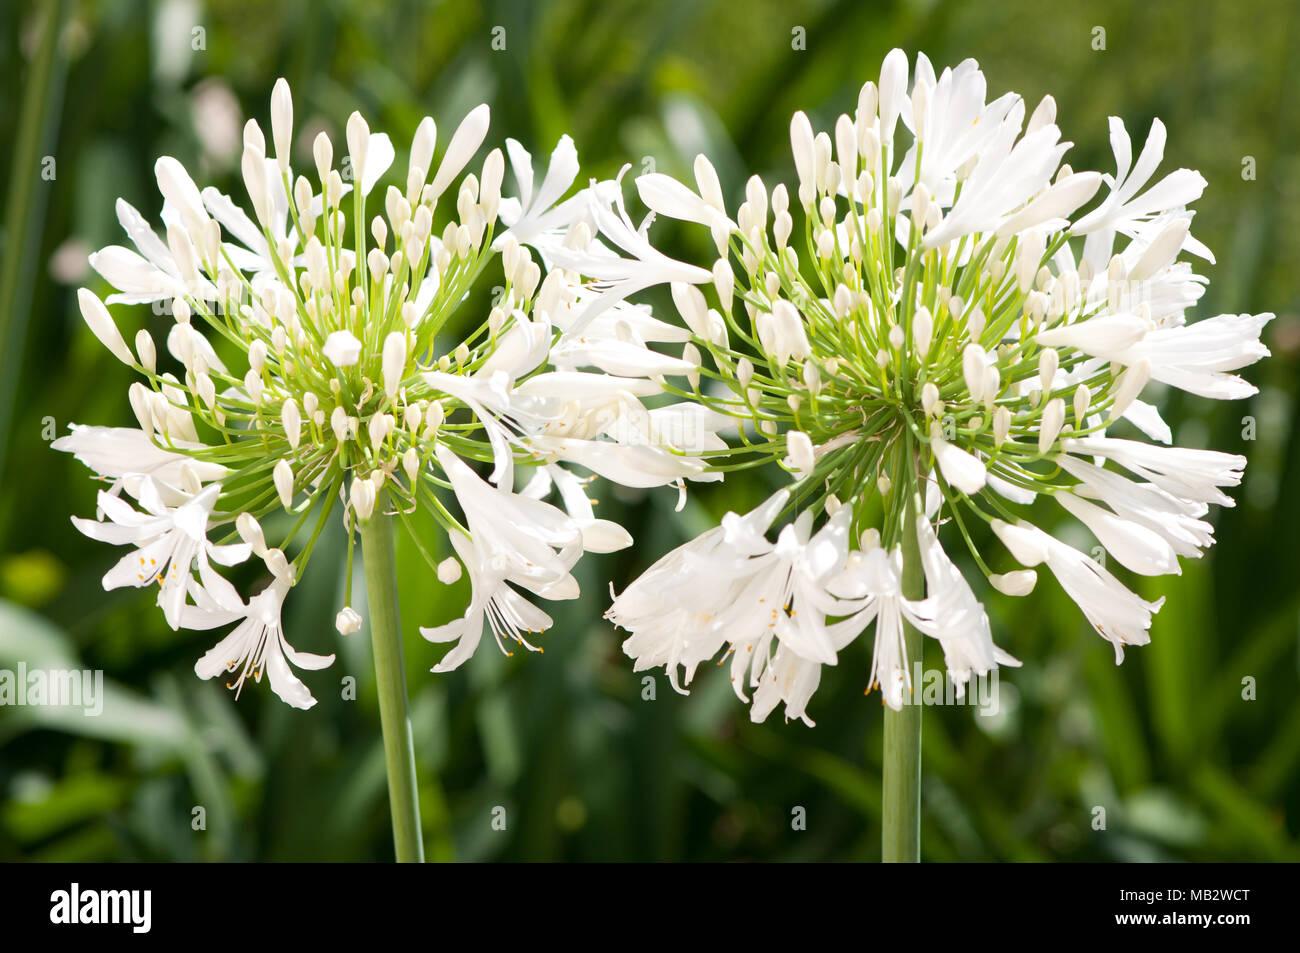 Agapanthus bianco le teste dei fiori Foto Stock